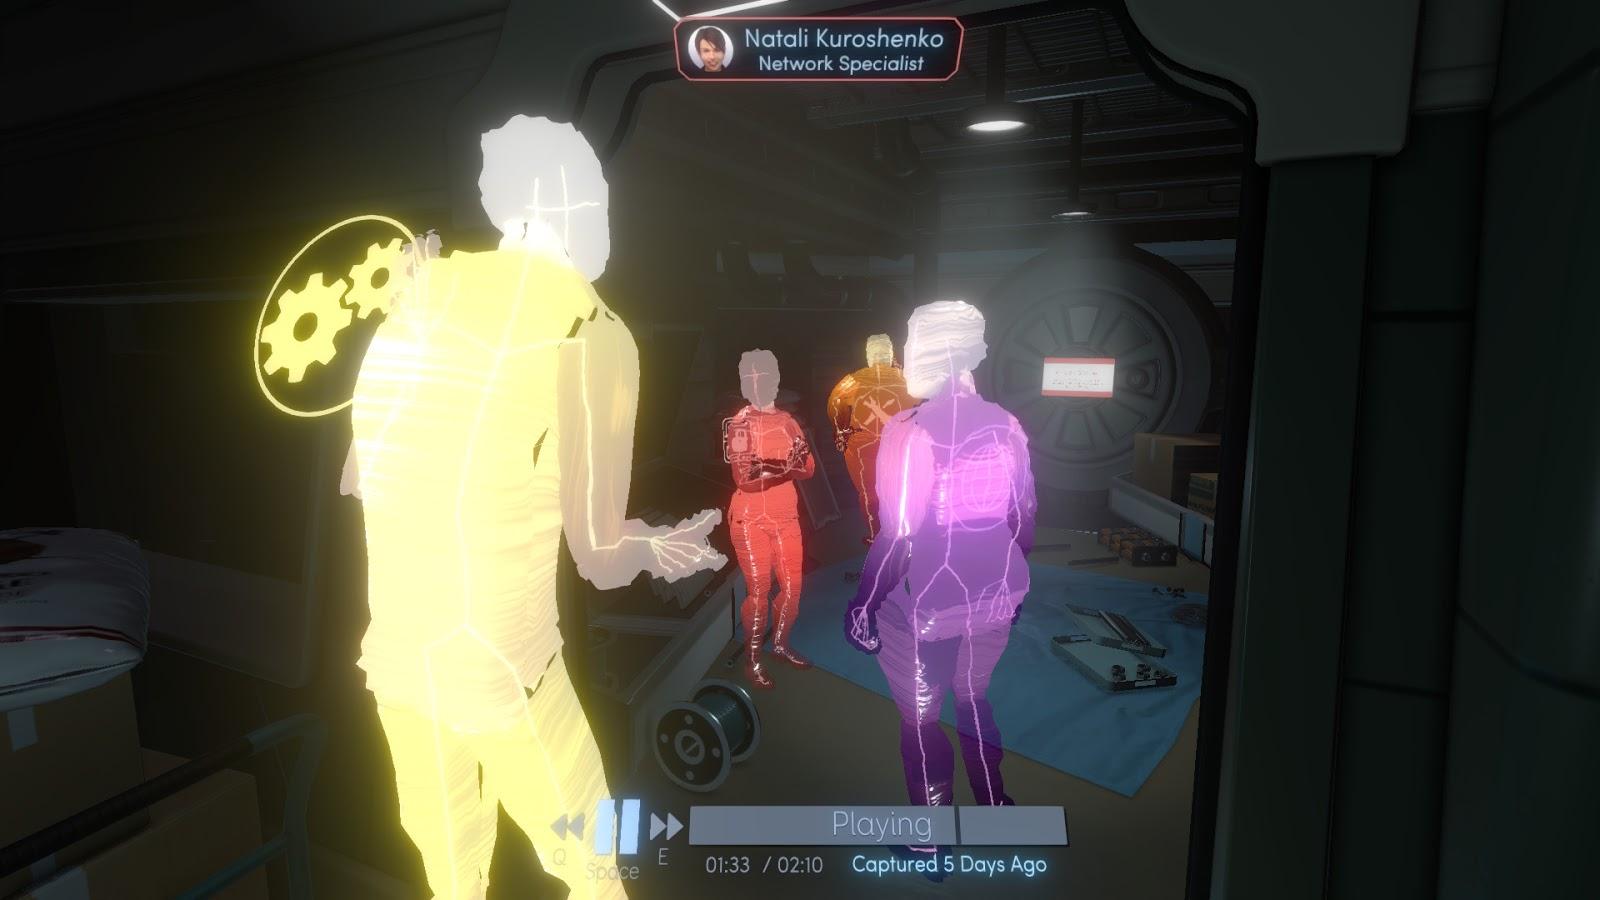 Tacoma, симулятор ходьбы в космосе, игра от создателей Gone Home, фантастика, SciFi, приключение, детектив, Adventure, обзор, рецензия